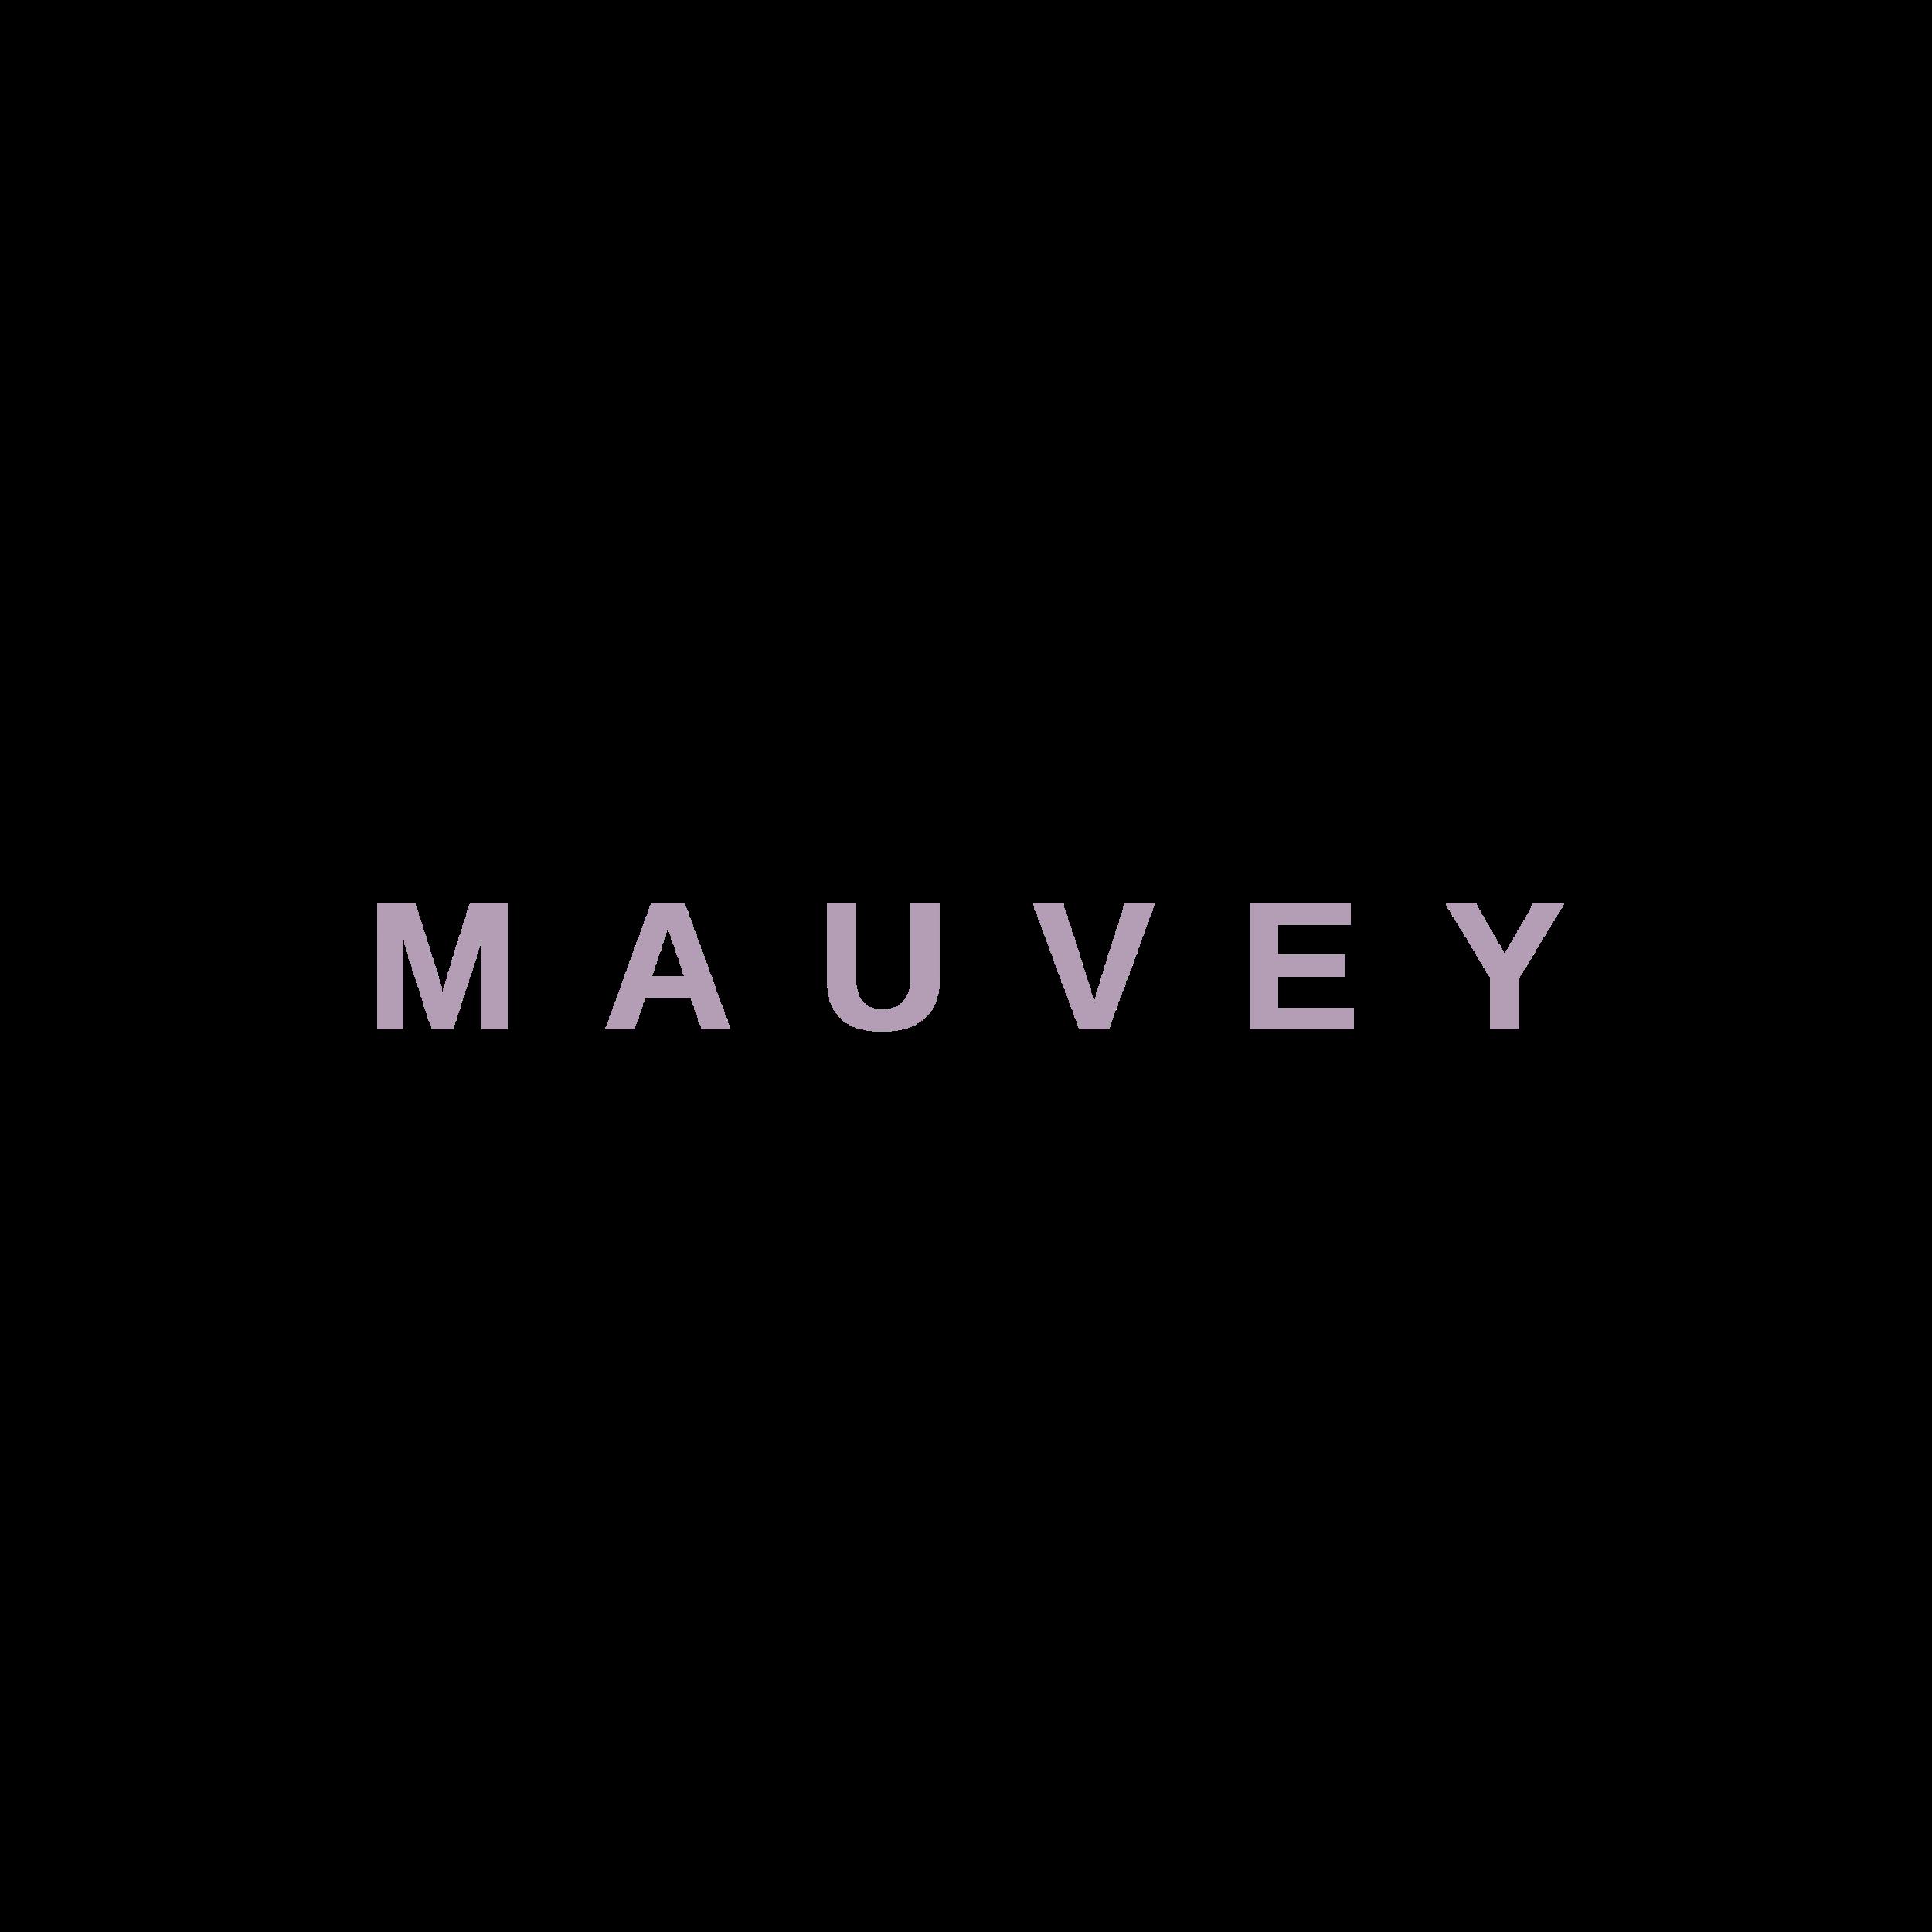 mauvey logo PNG.png